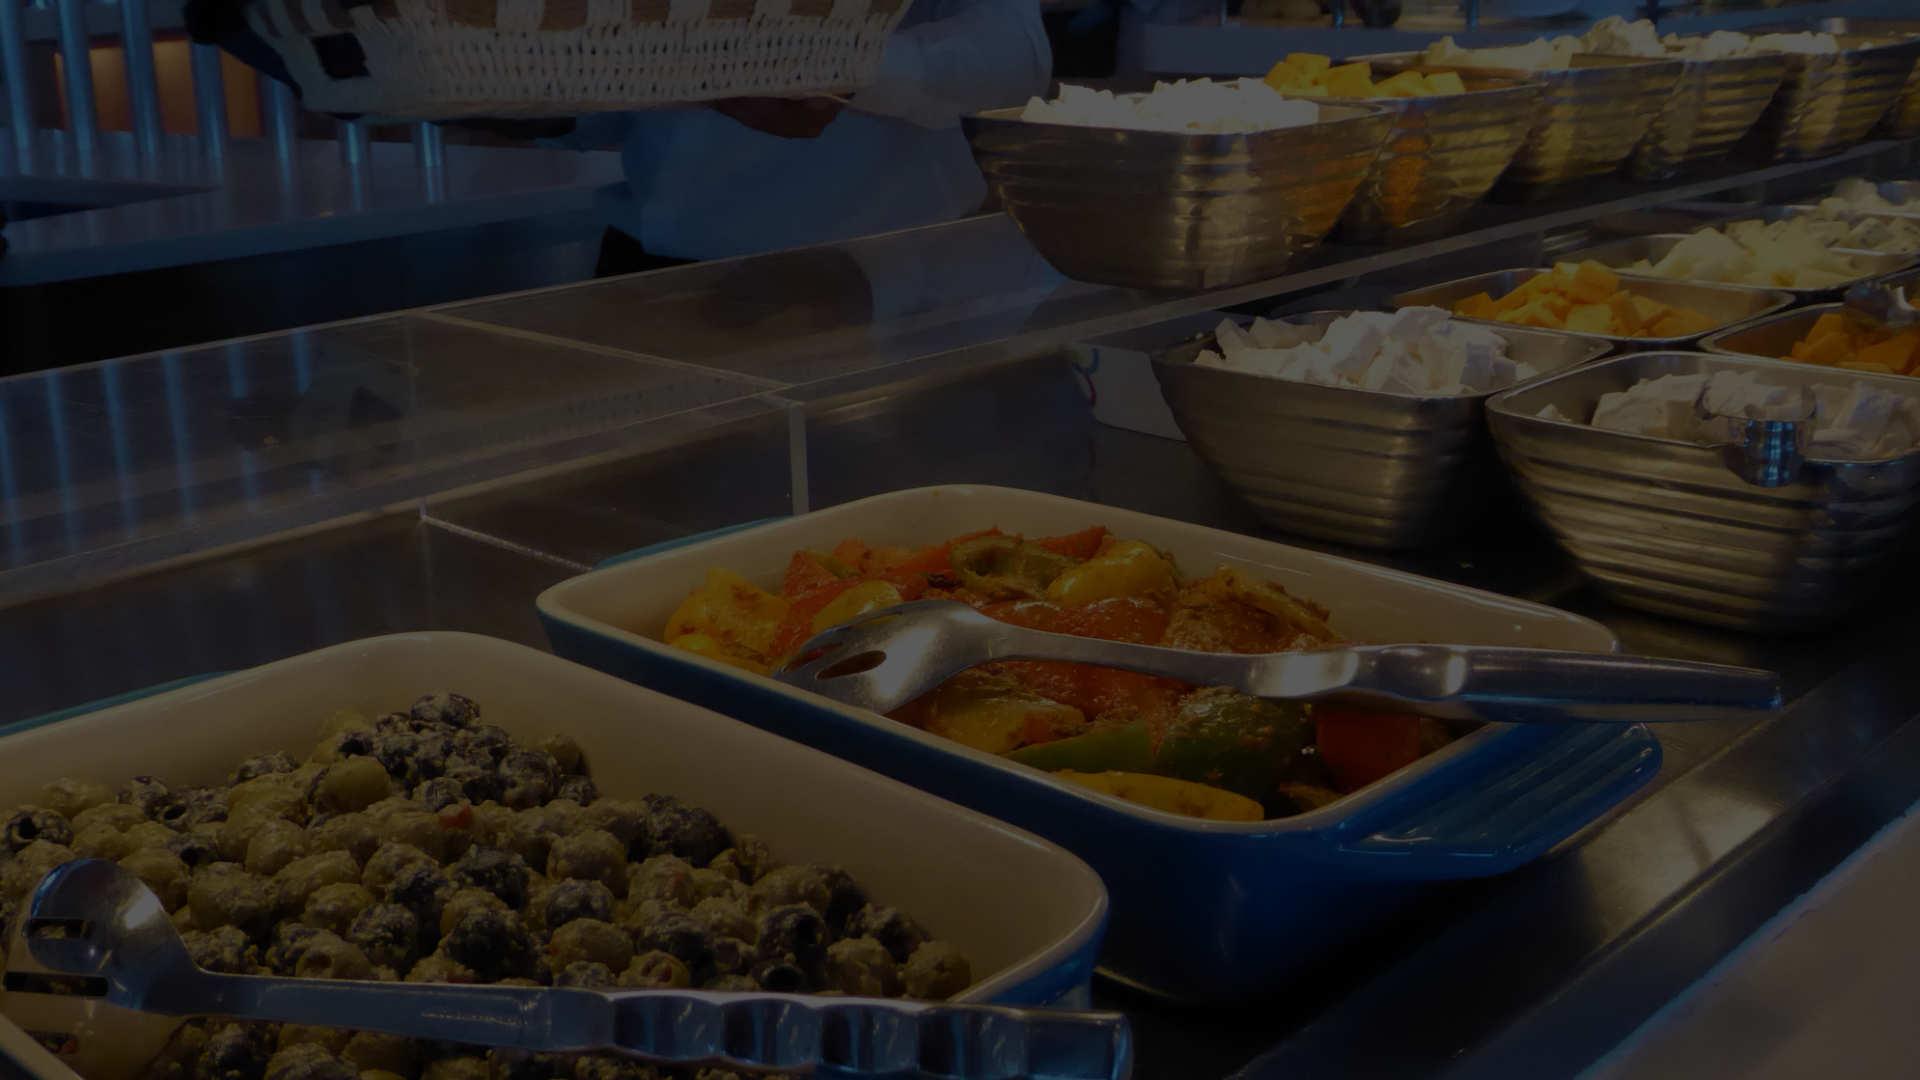 culinaria-partyservice-augsburg-03